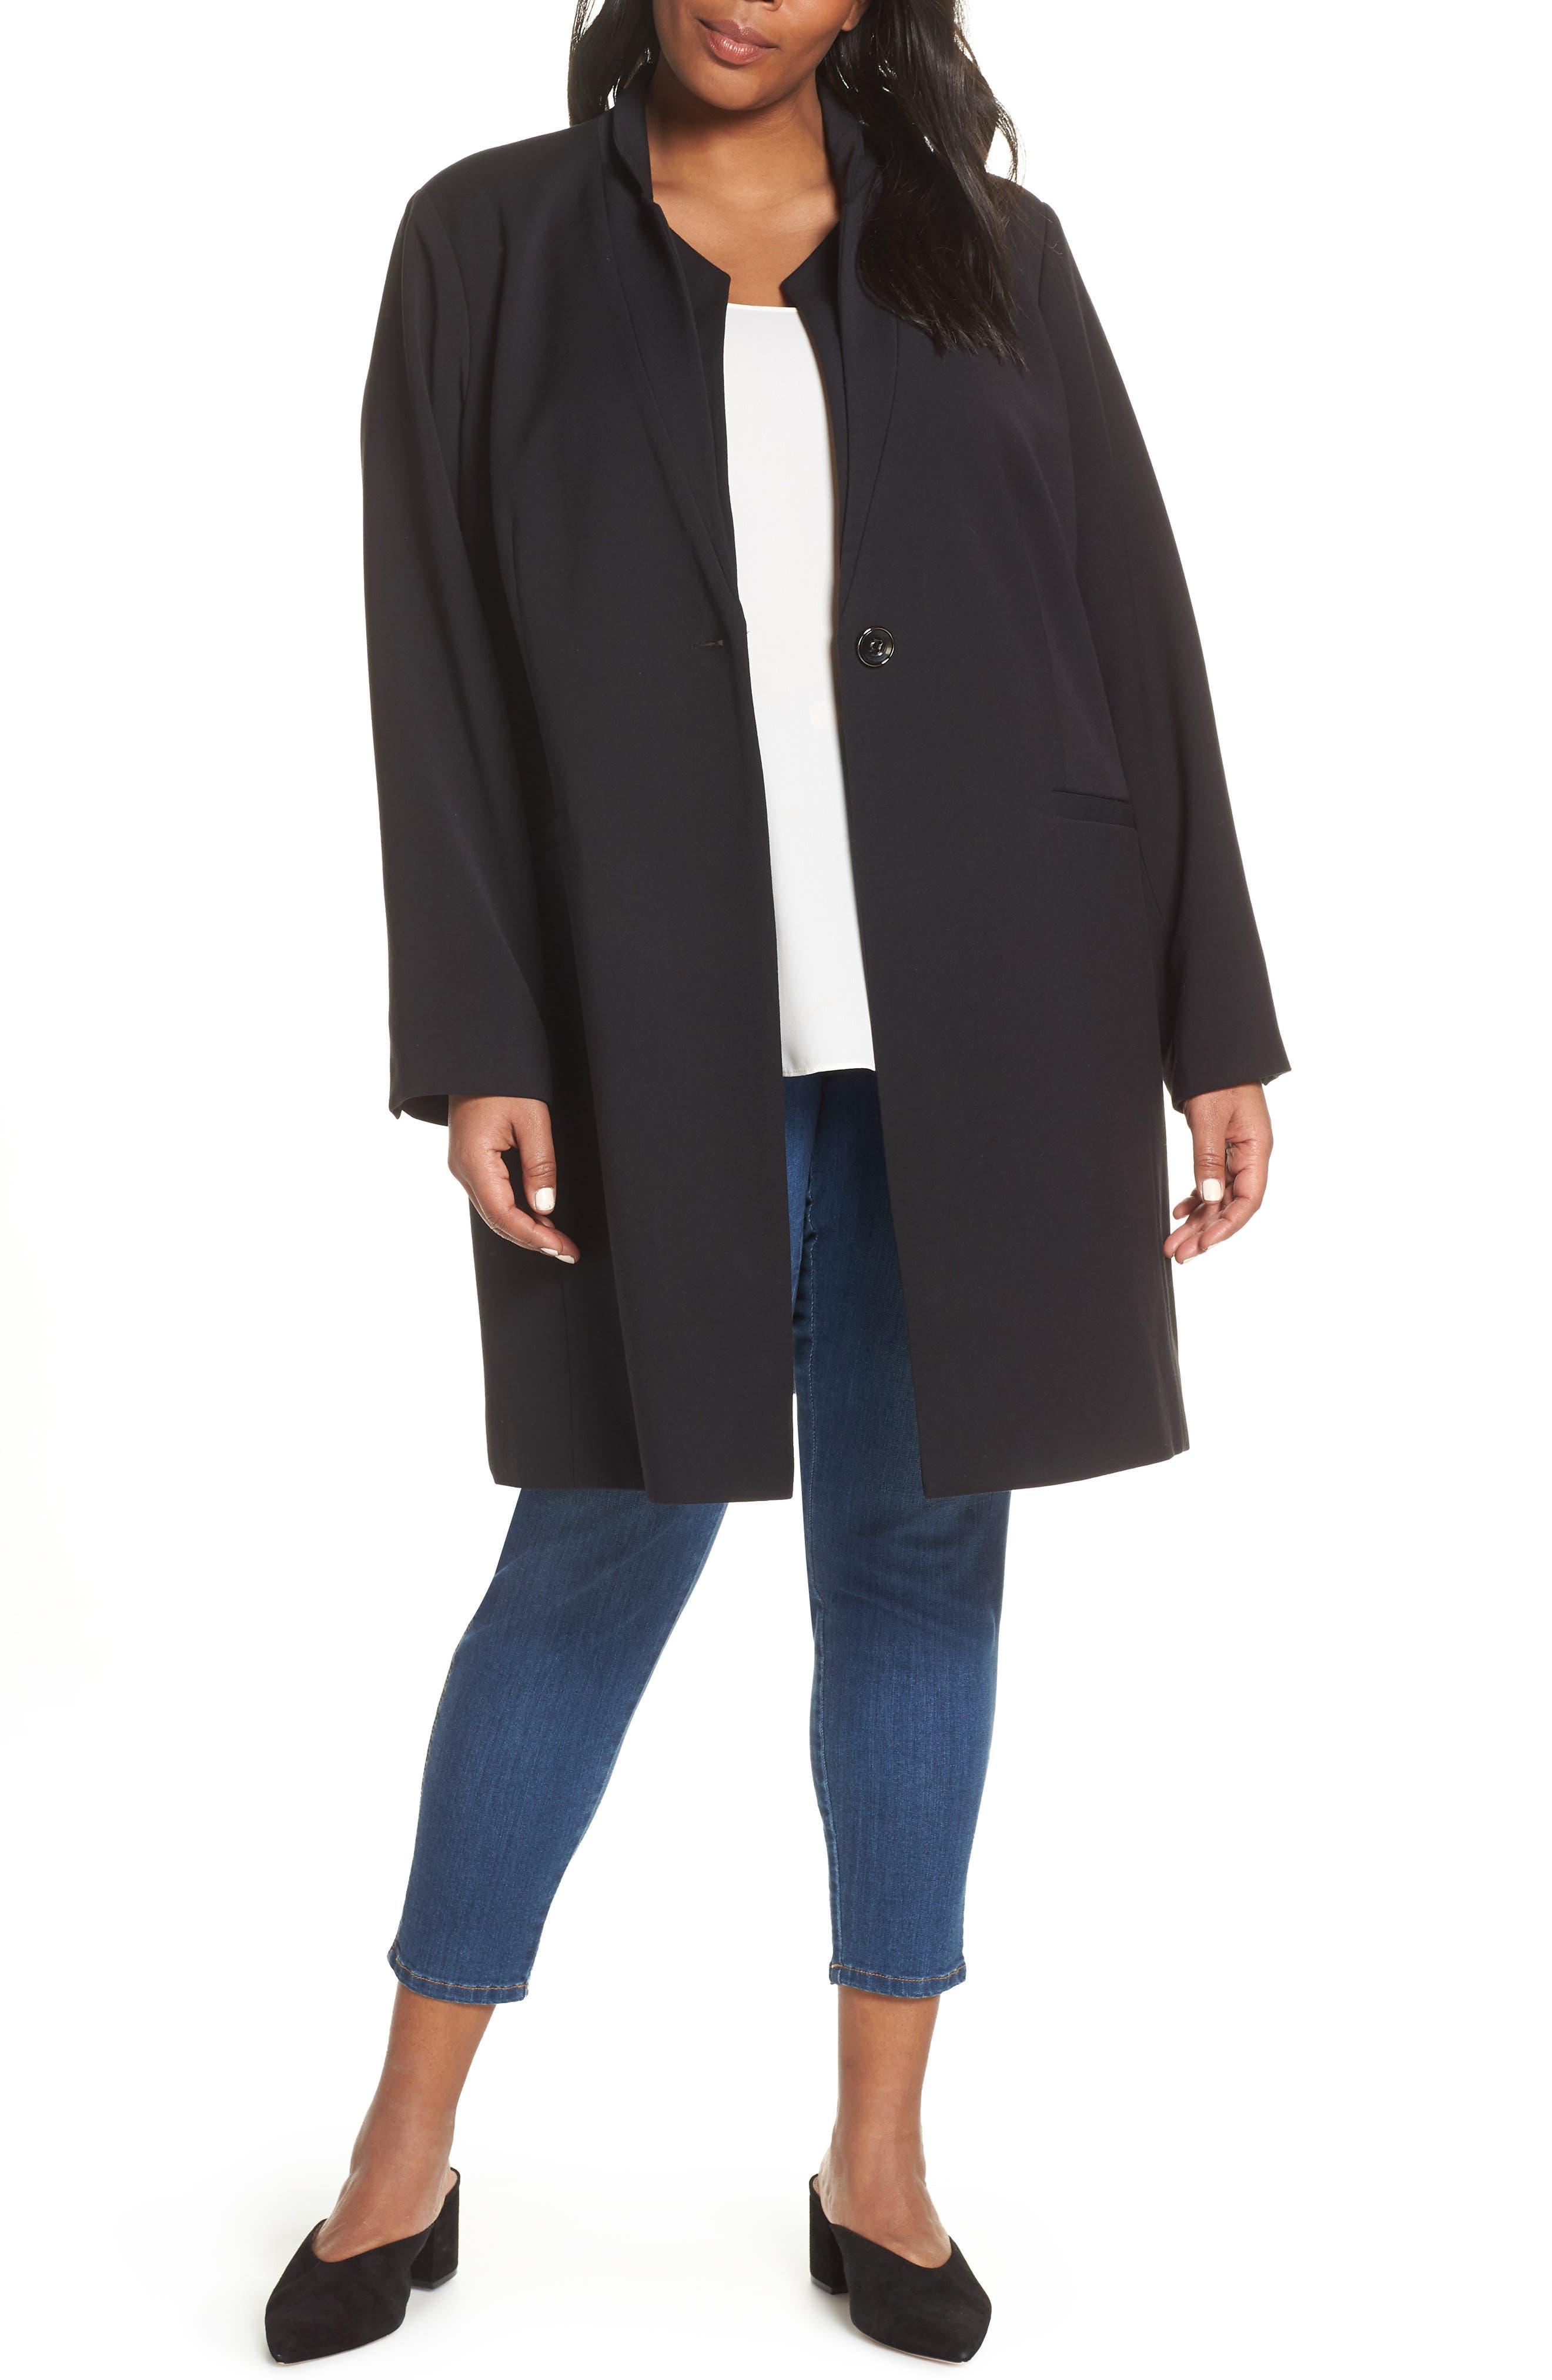 KENNETH COLE NEW YORK Inverted Collar Ponte Jacket, Main, color, BLACK